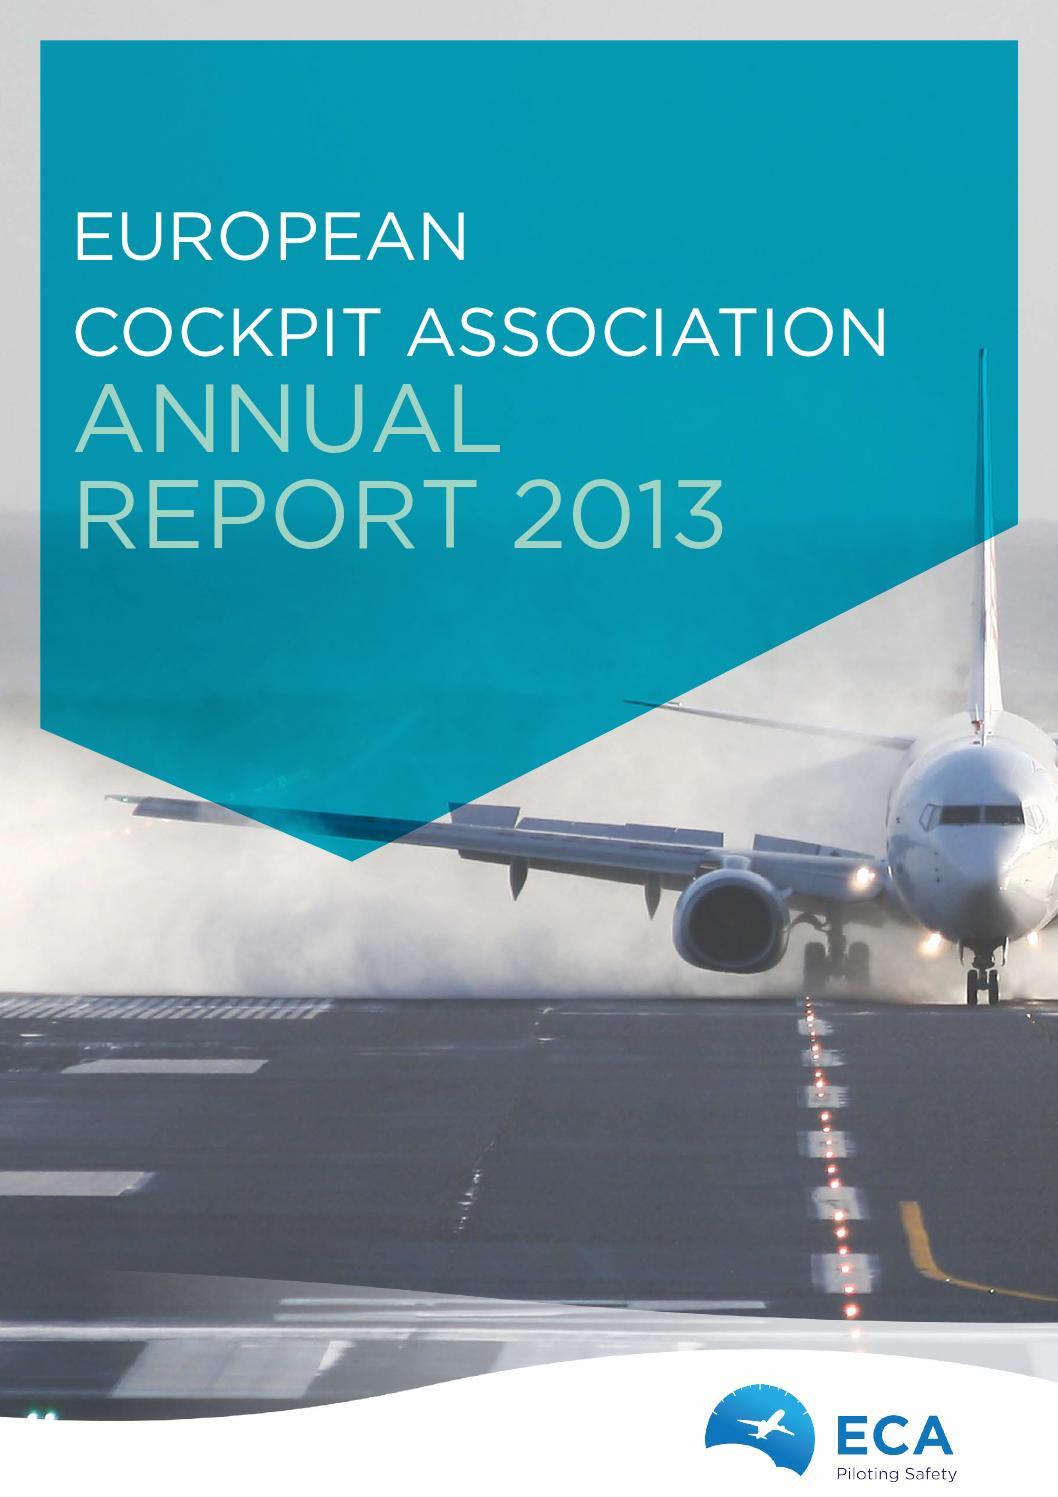 European Cockpit Association Eca: ECA Annual Report 2013 By European Cockpit Association ECA